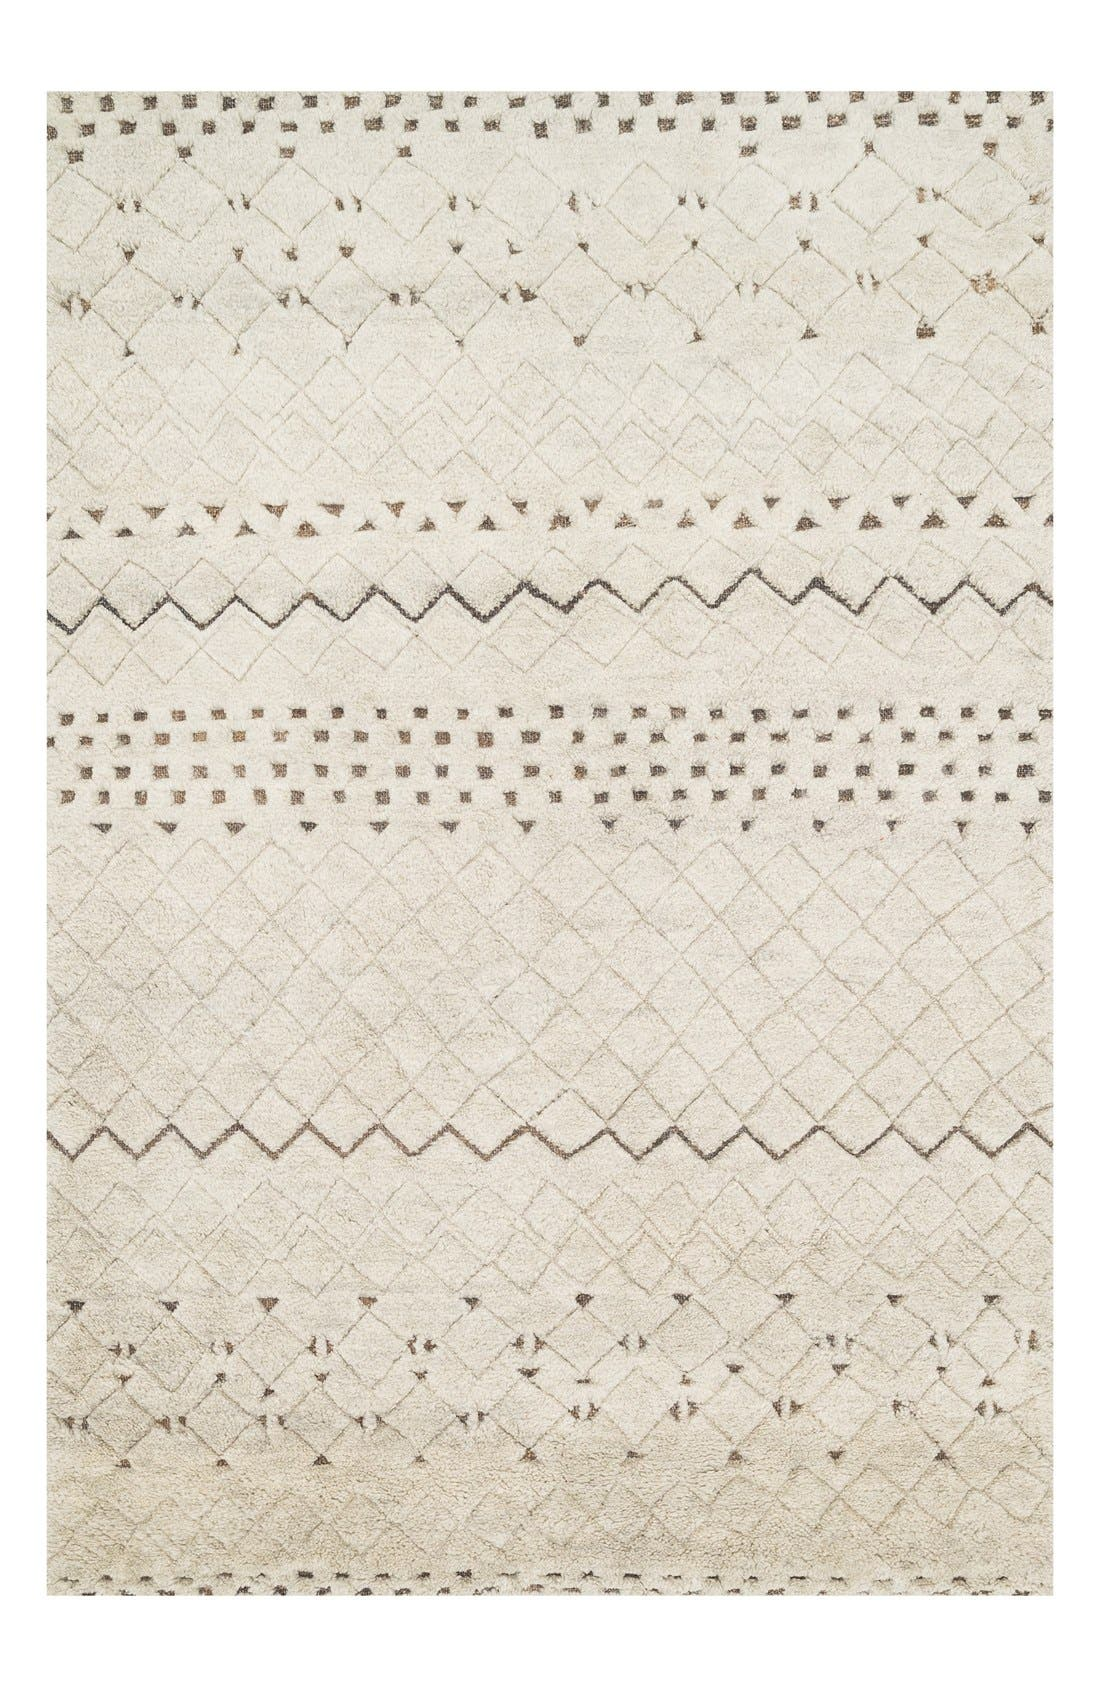 Main Image - Loloi 'Tanzania' Wool & Jute Area Rug